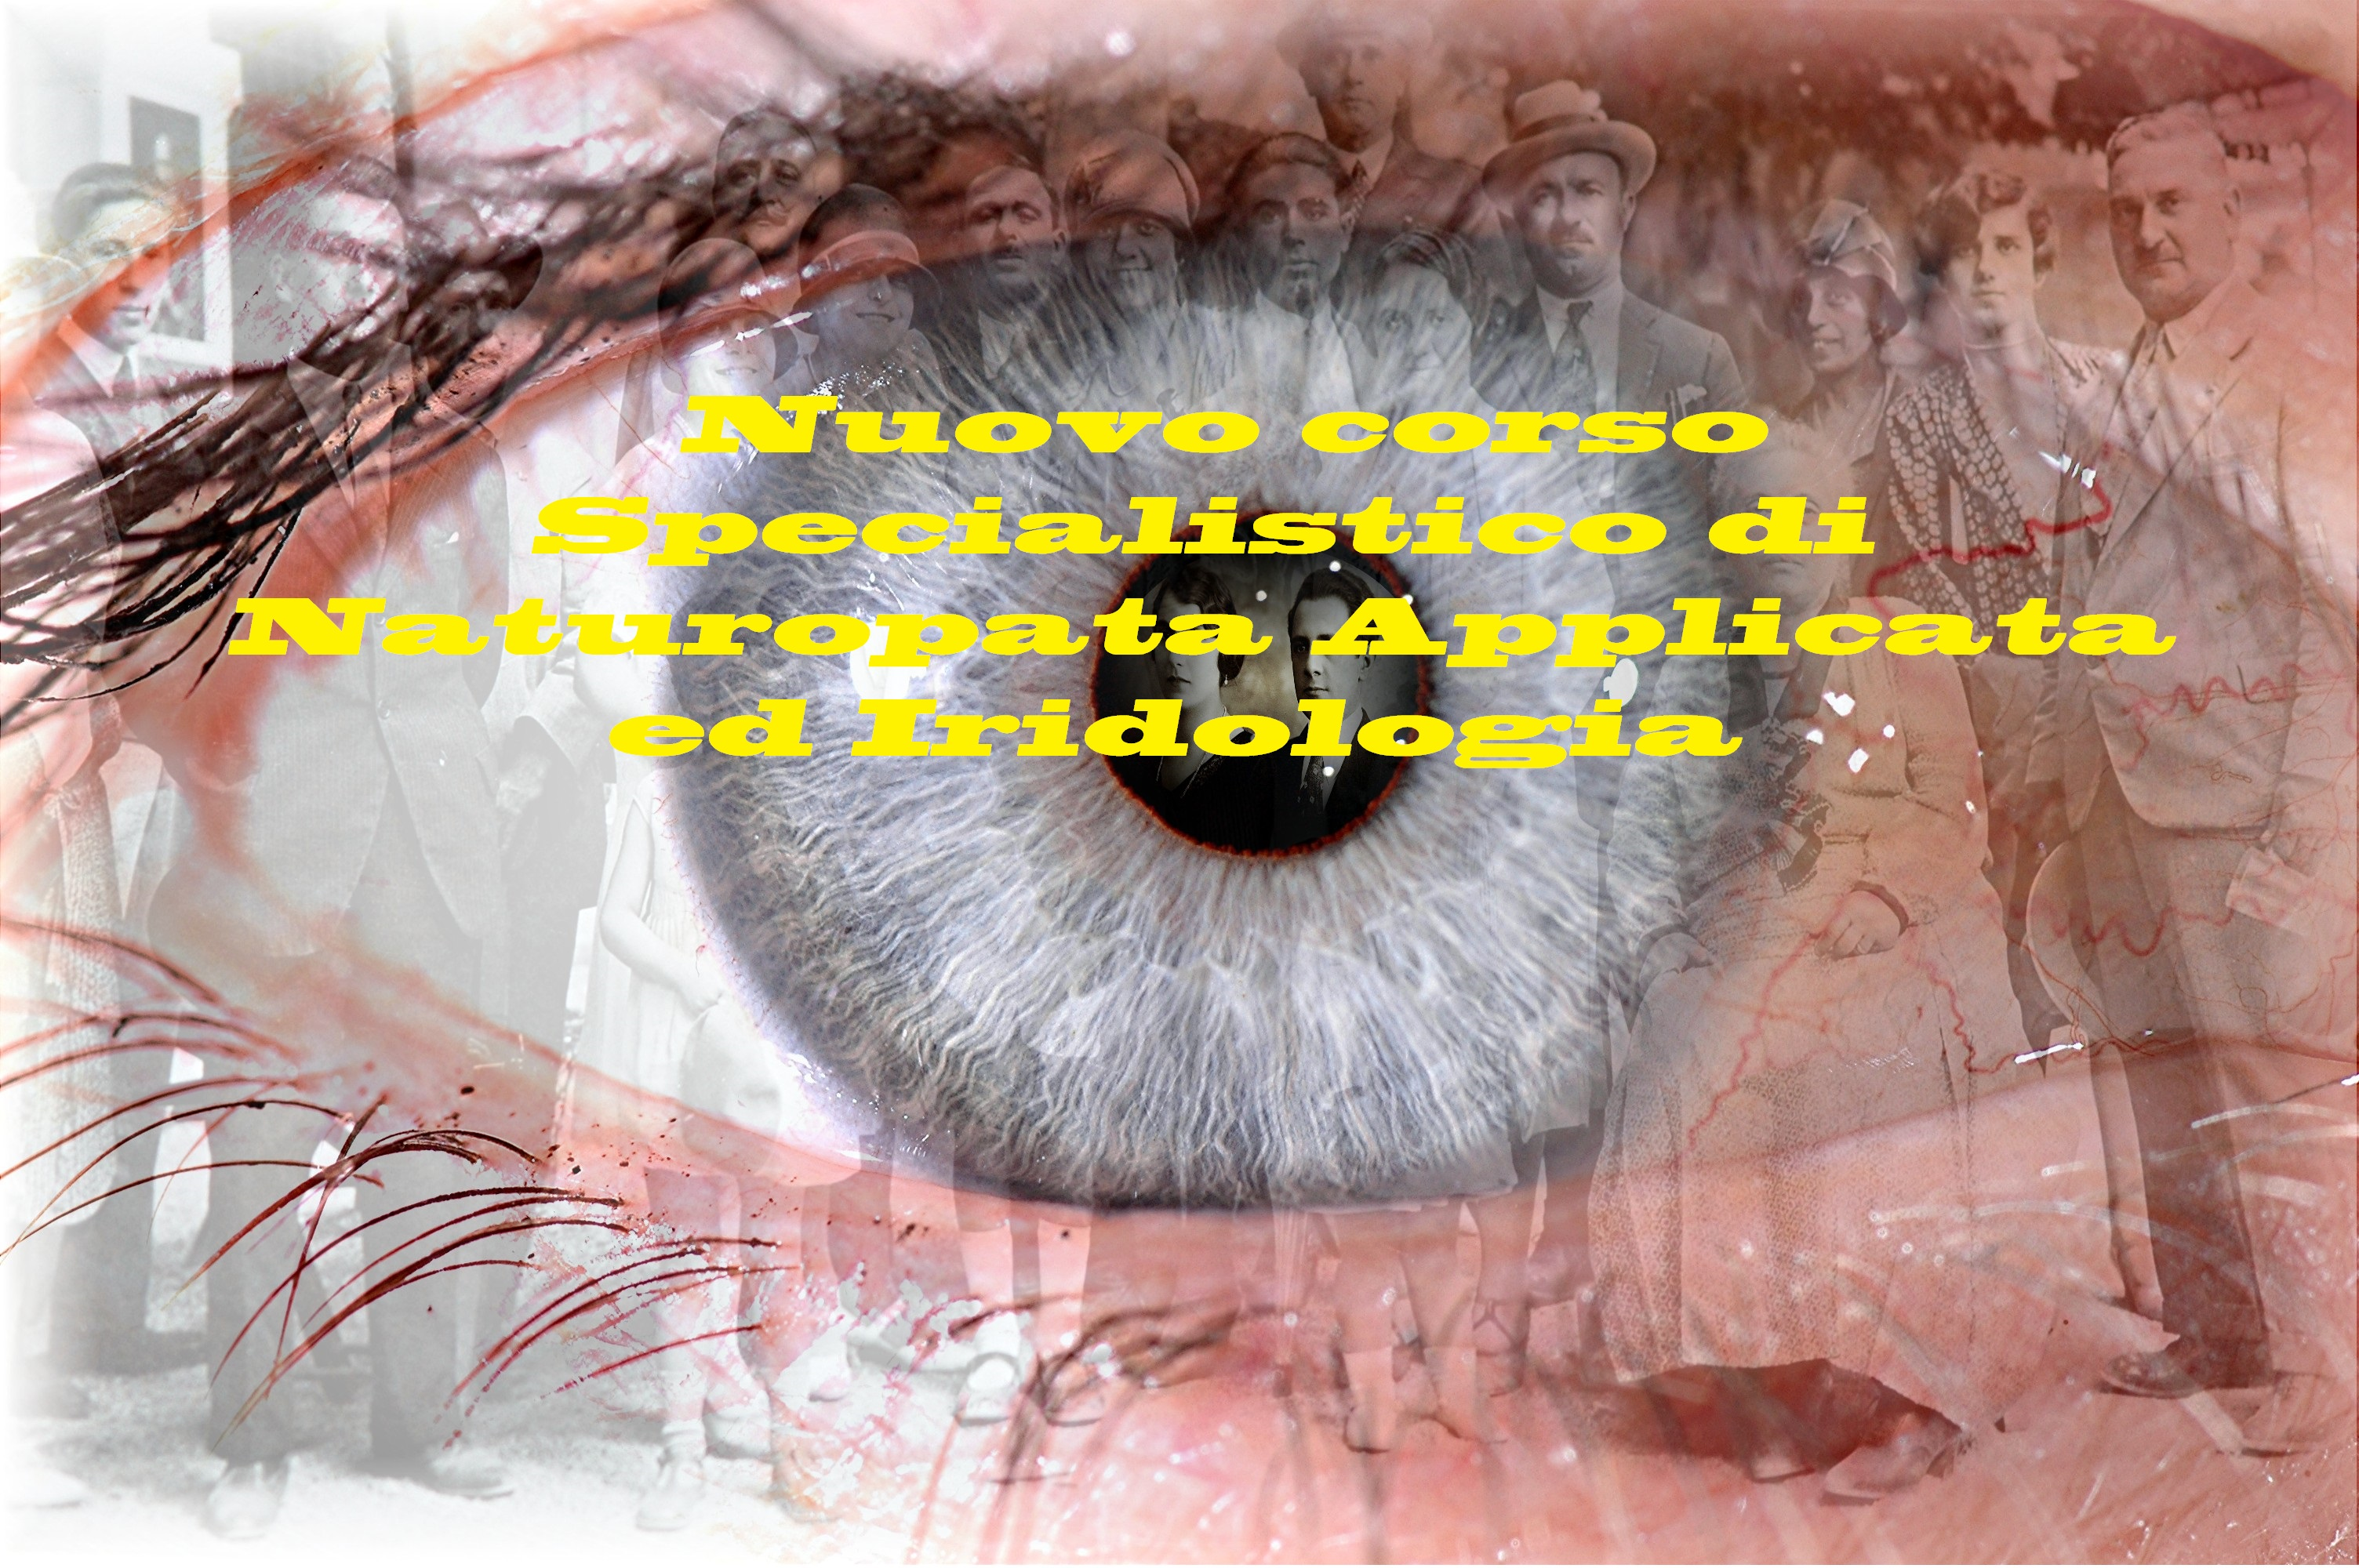 Corso di Naturopatia ed Iridologia 2015